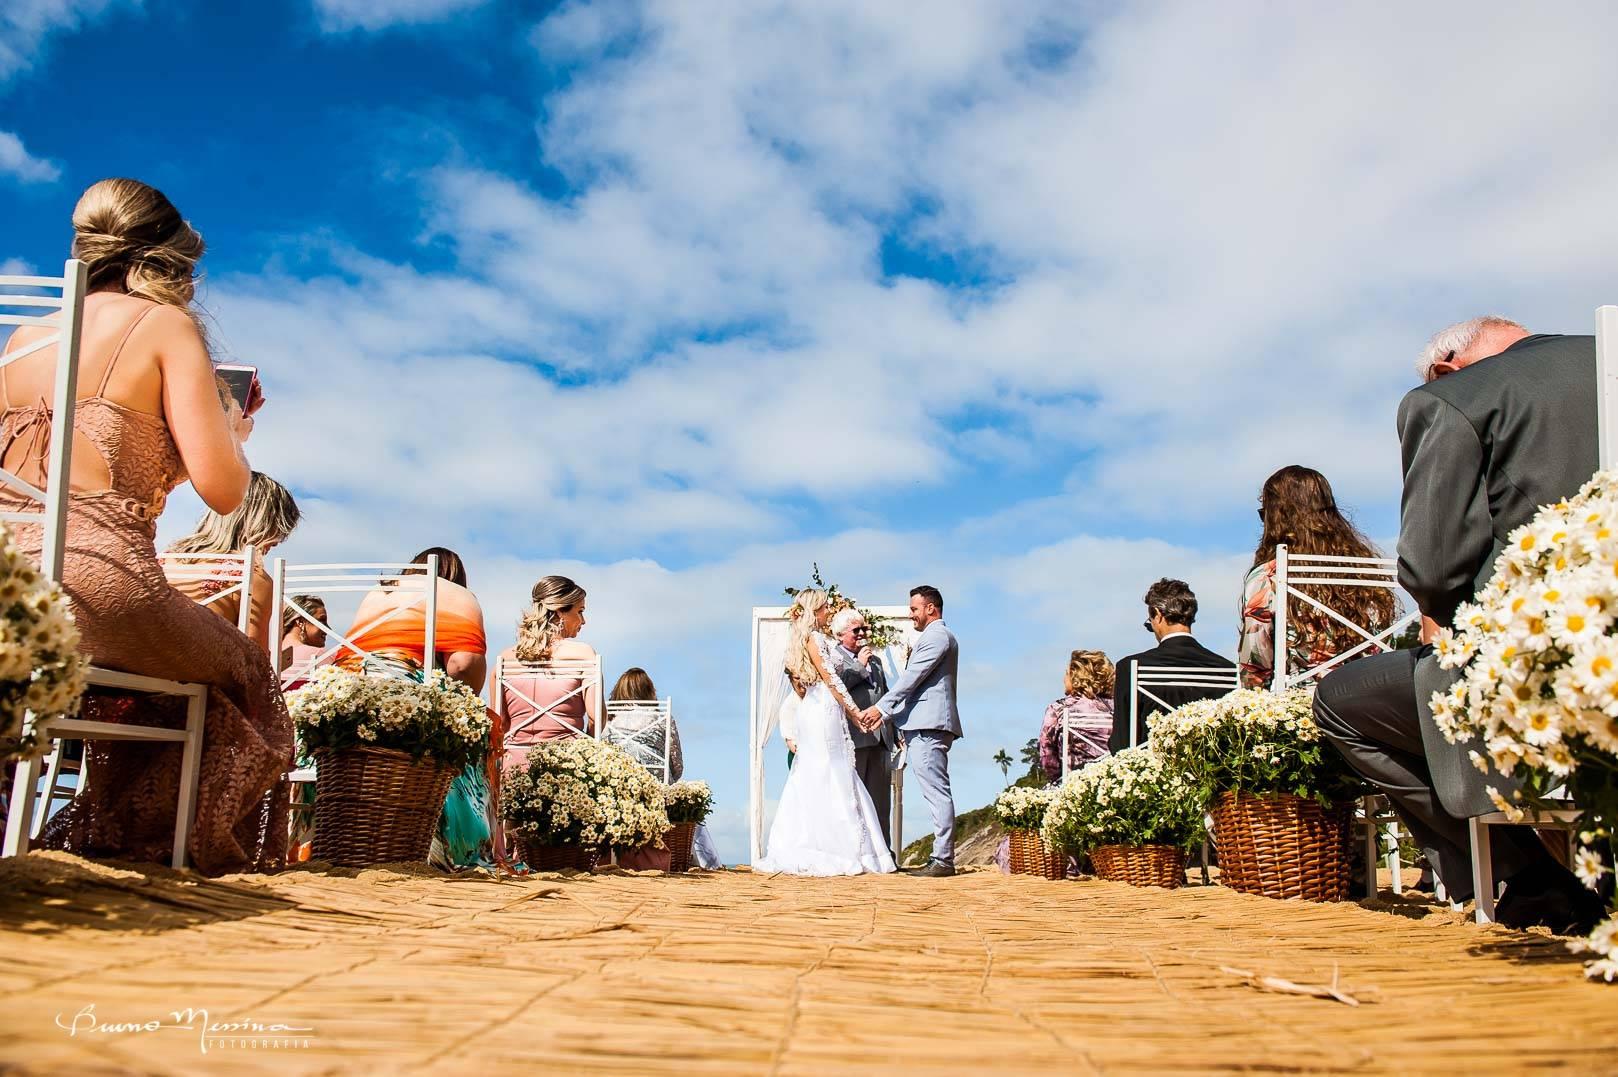 casamento-ao-ar-livre-casamento-na-praia-fotos-casamento-de-dia54